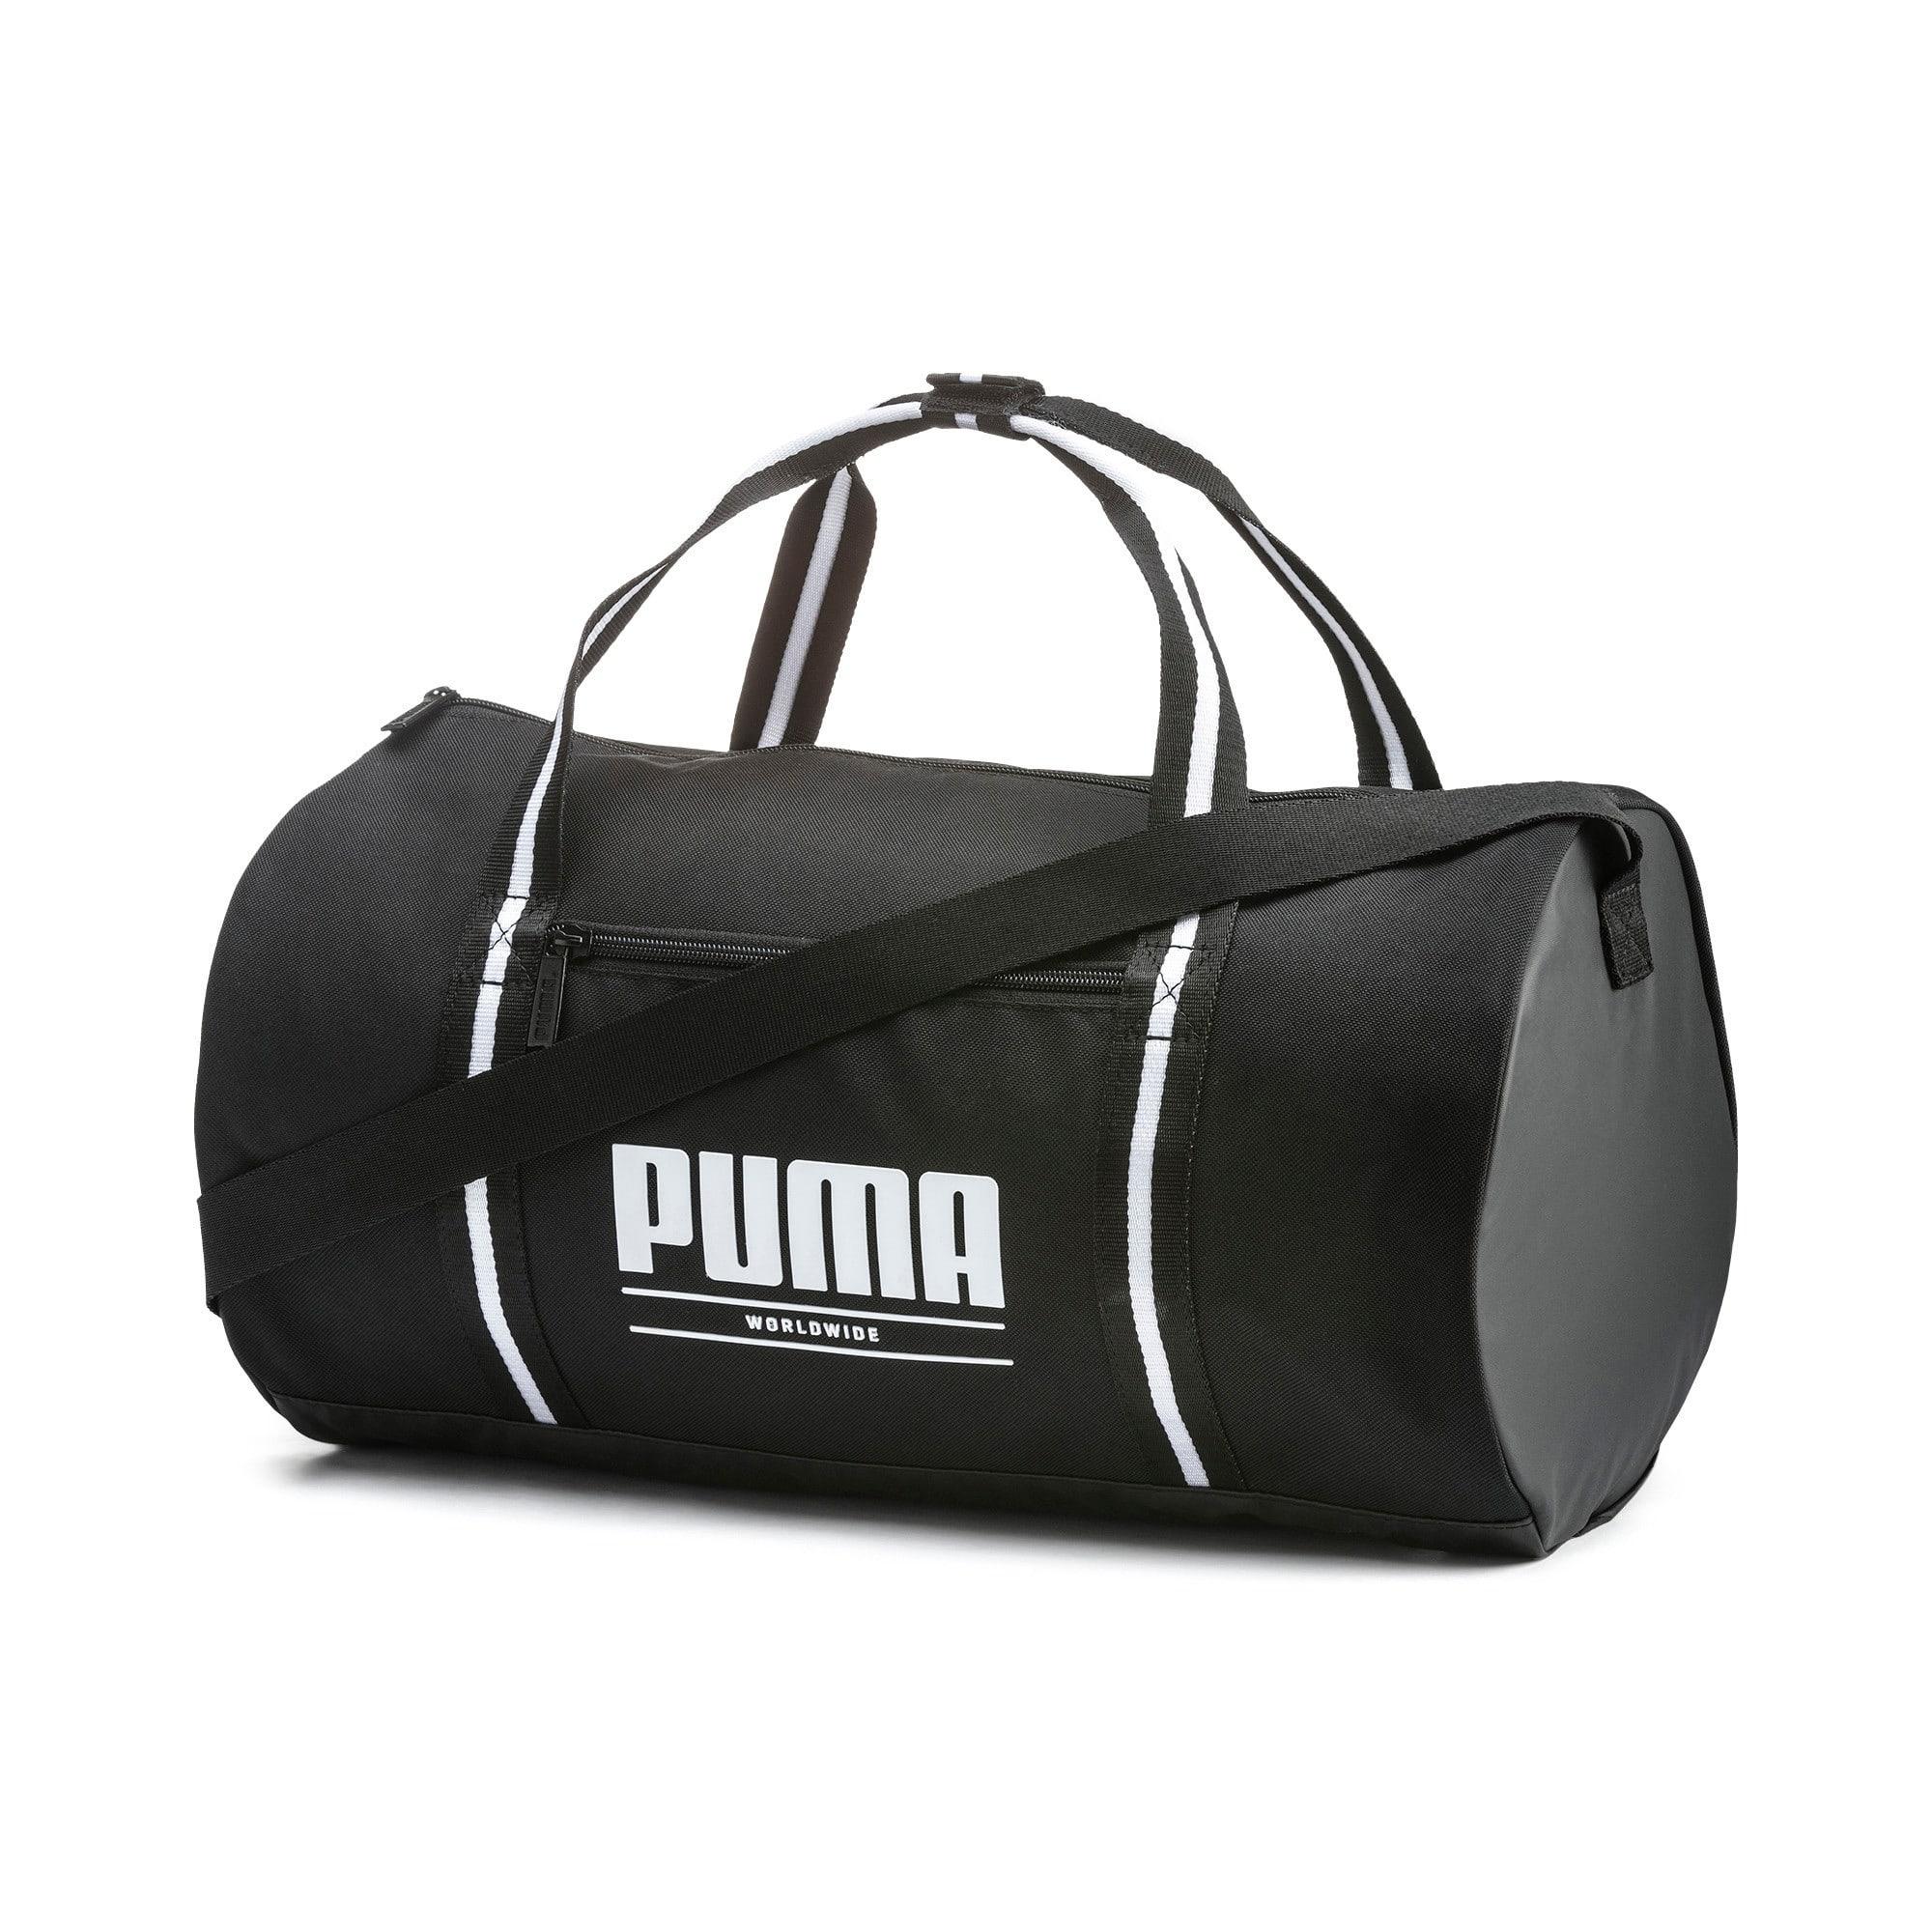 Thumbnail 1 of Core Base Barrel Bag, Puma Black, medium